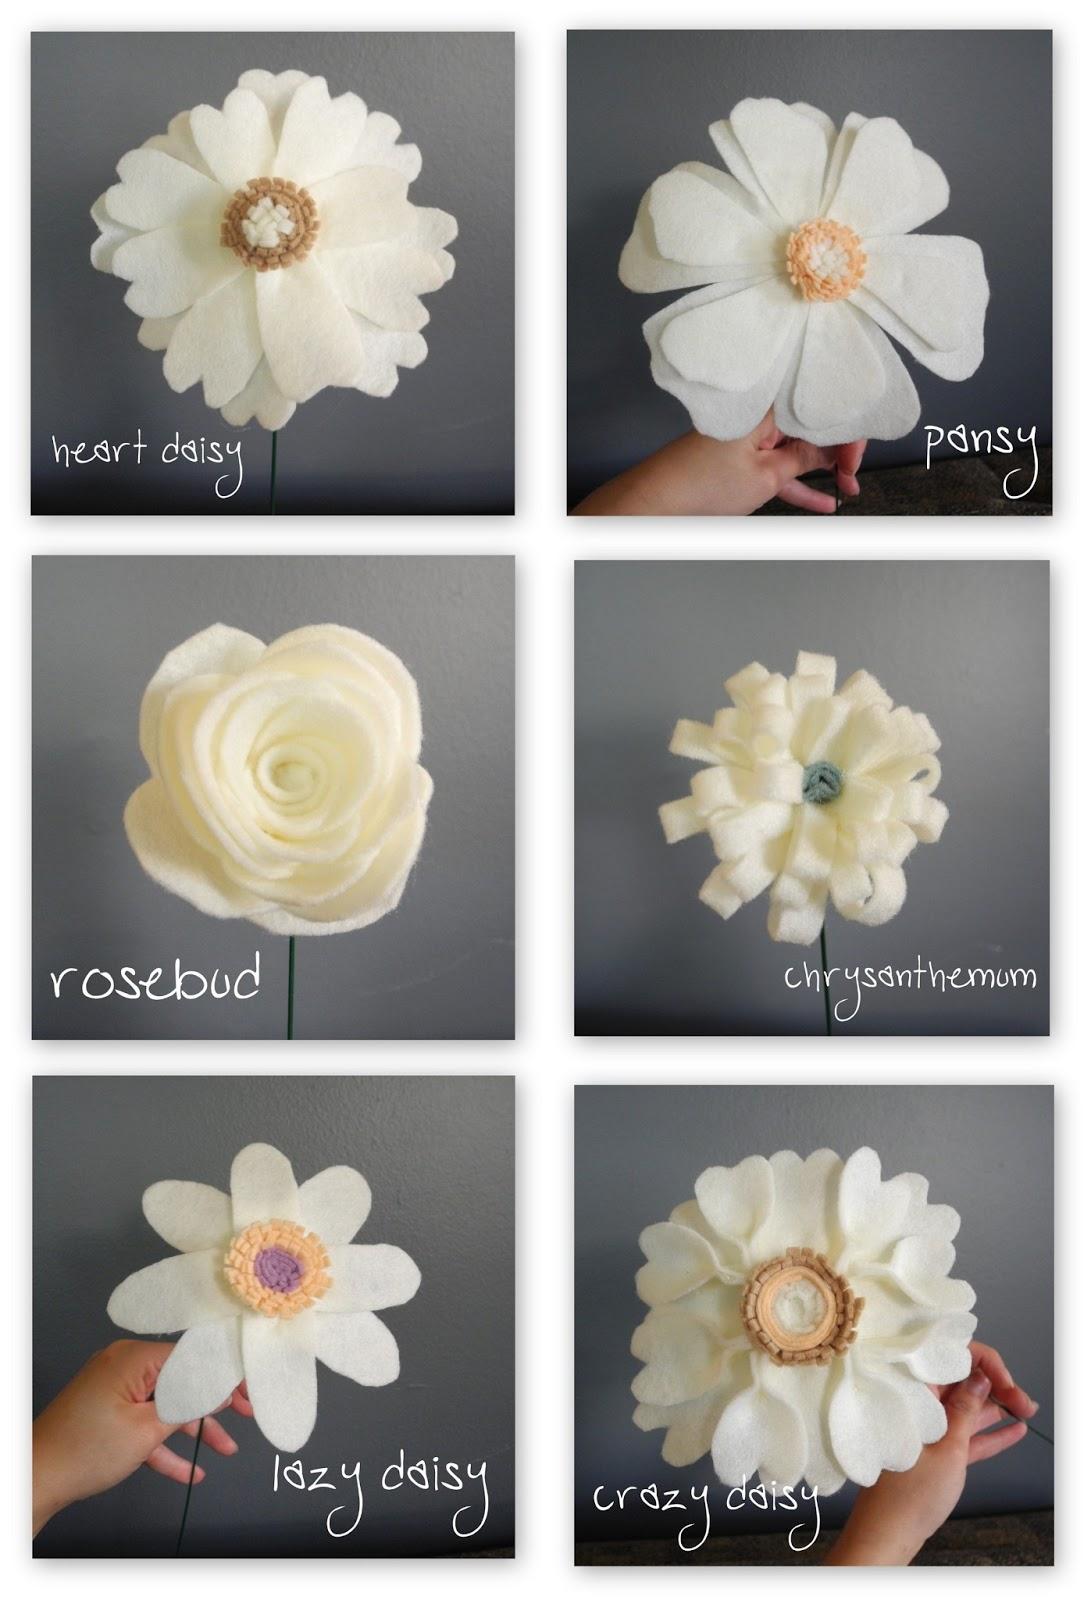 Librarian Tells All: Handmade Felt Wedding Bouquets Look Like a ...